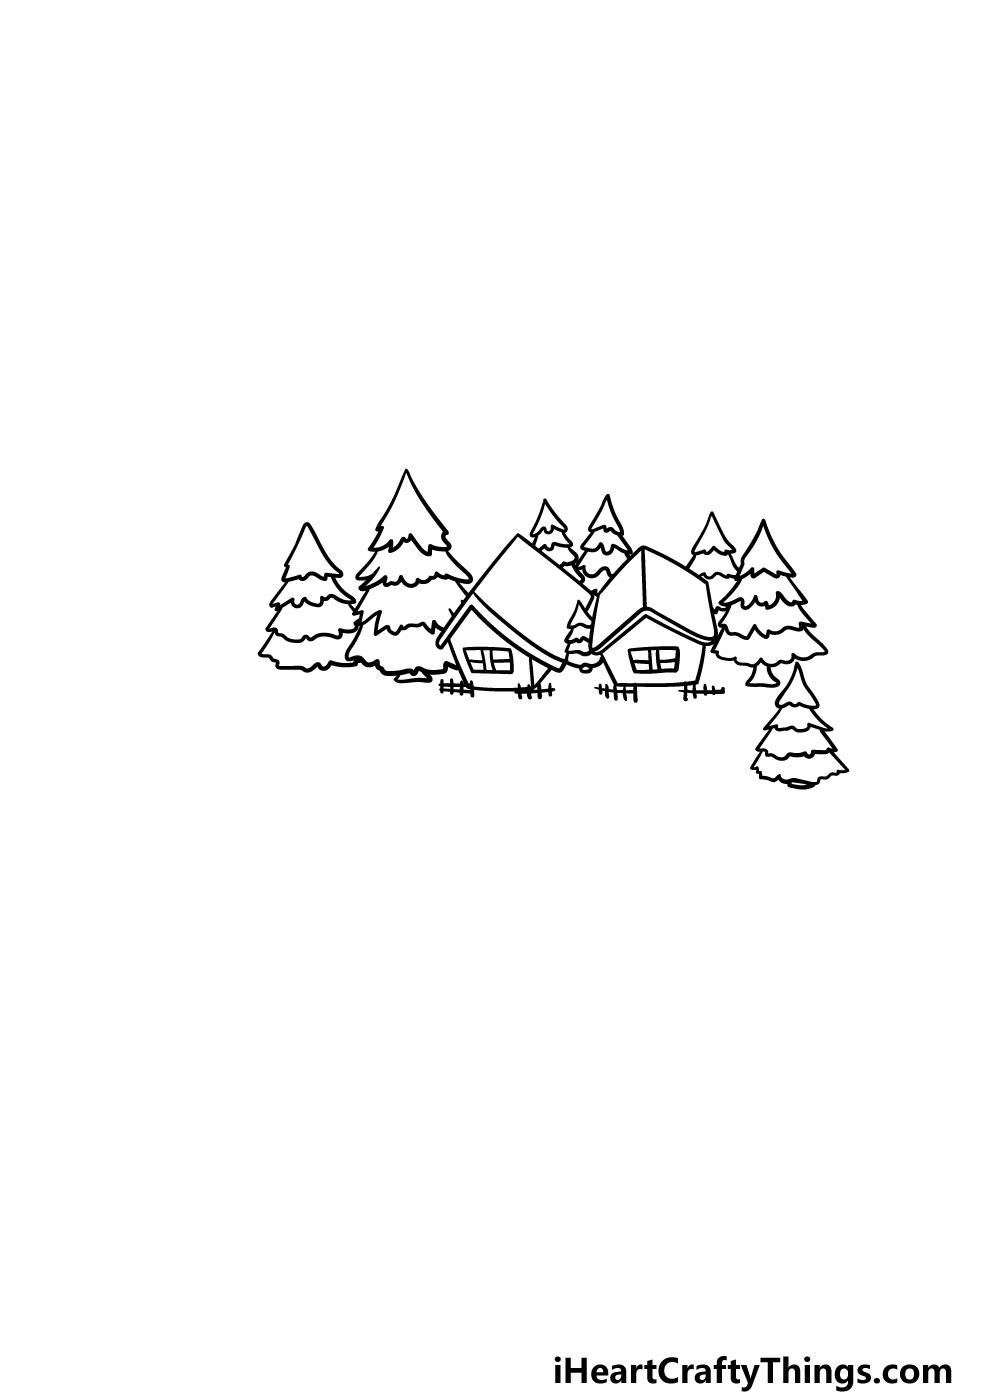 drawing a lake step 5